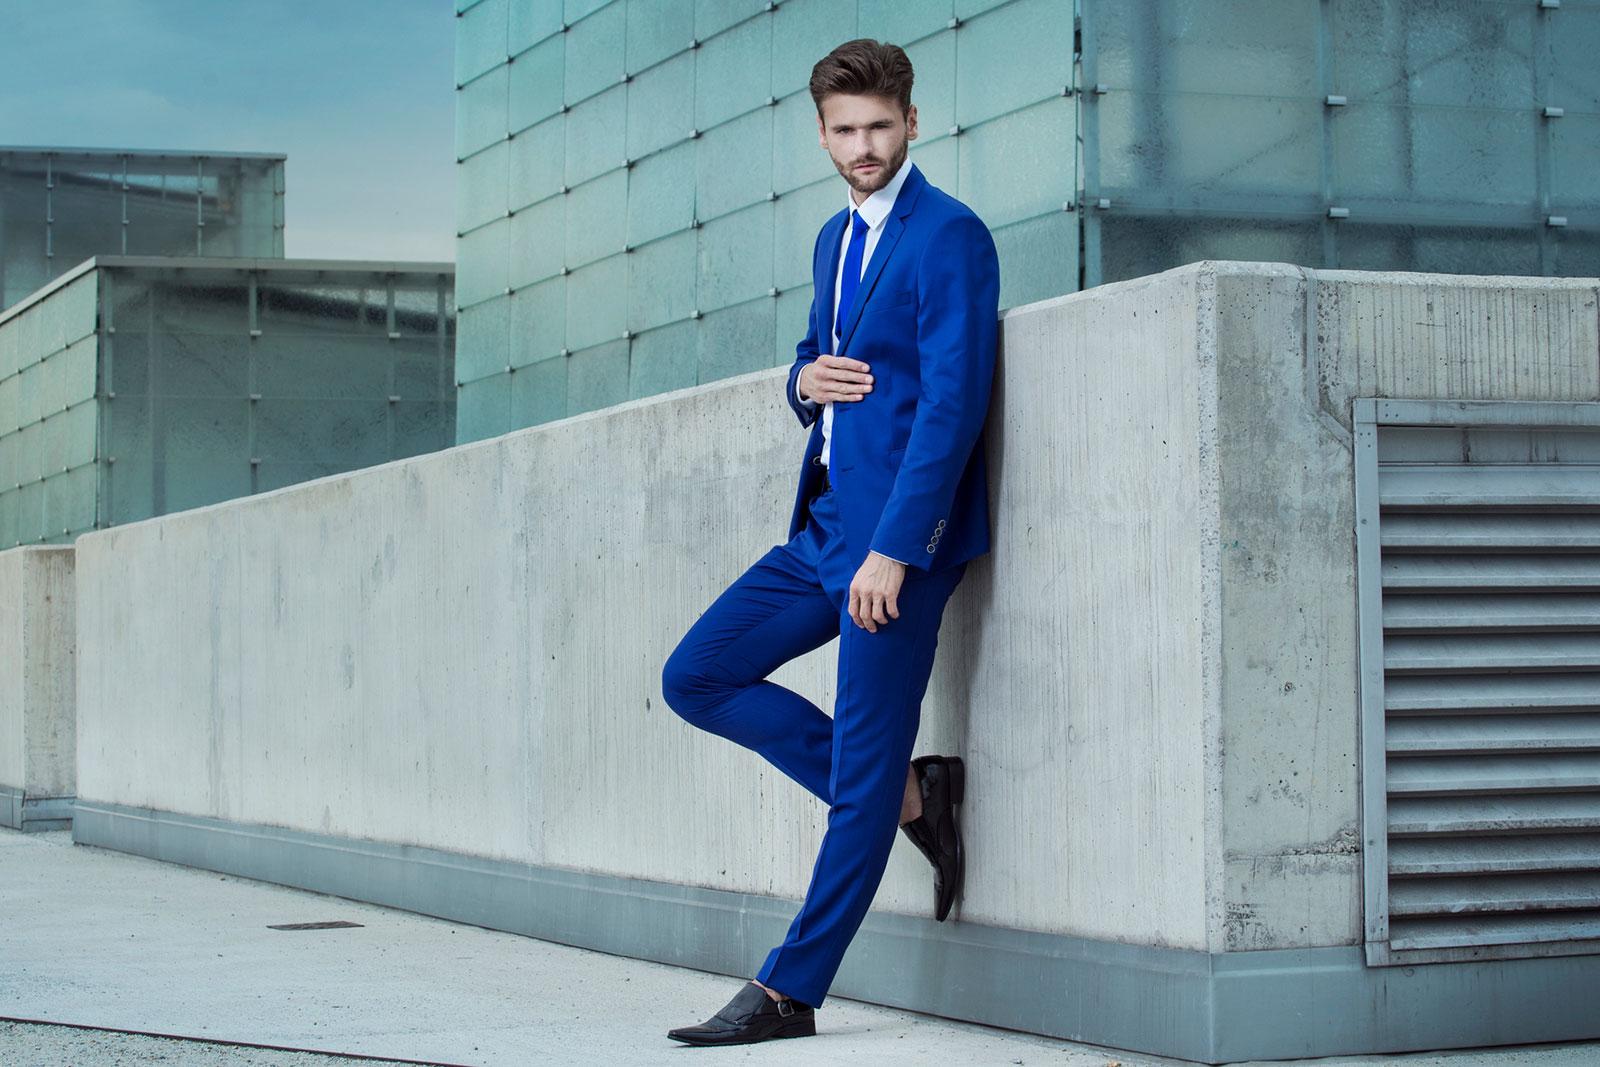 211783-1600×1067-Tall-man-in-fashion